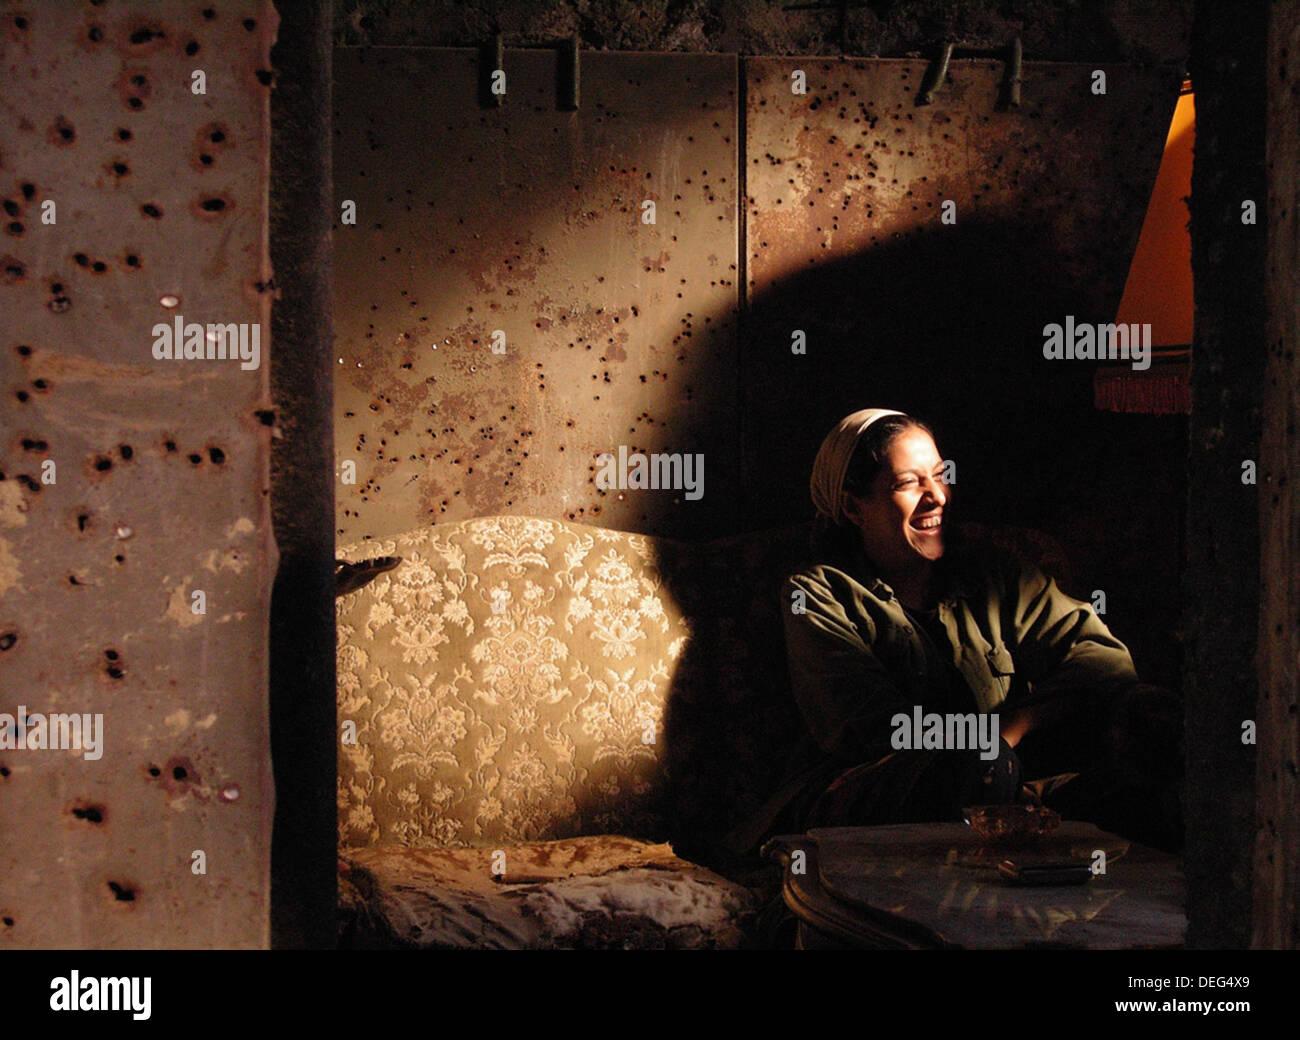 THIRST (2004) TAWFIK ABU WAEL (DIR) 003 MOVIESTORE COLLECTION LTD - Stock Image